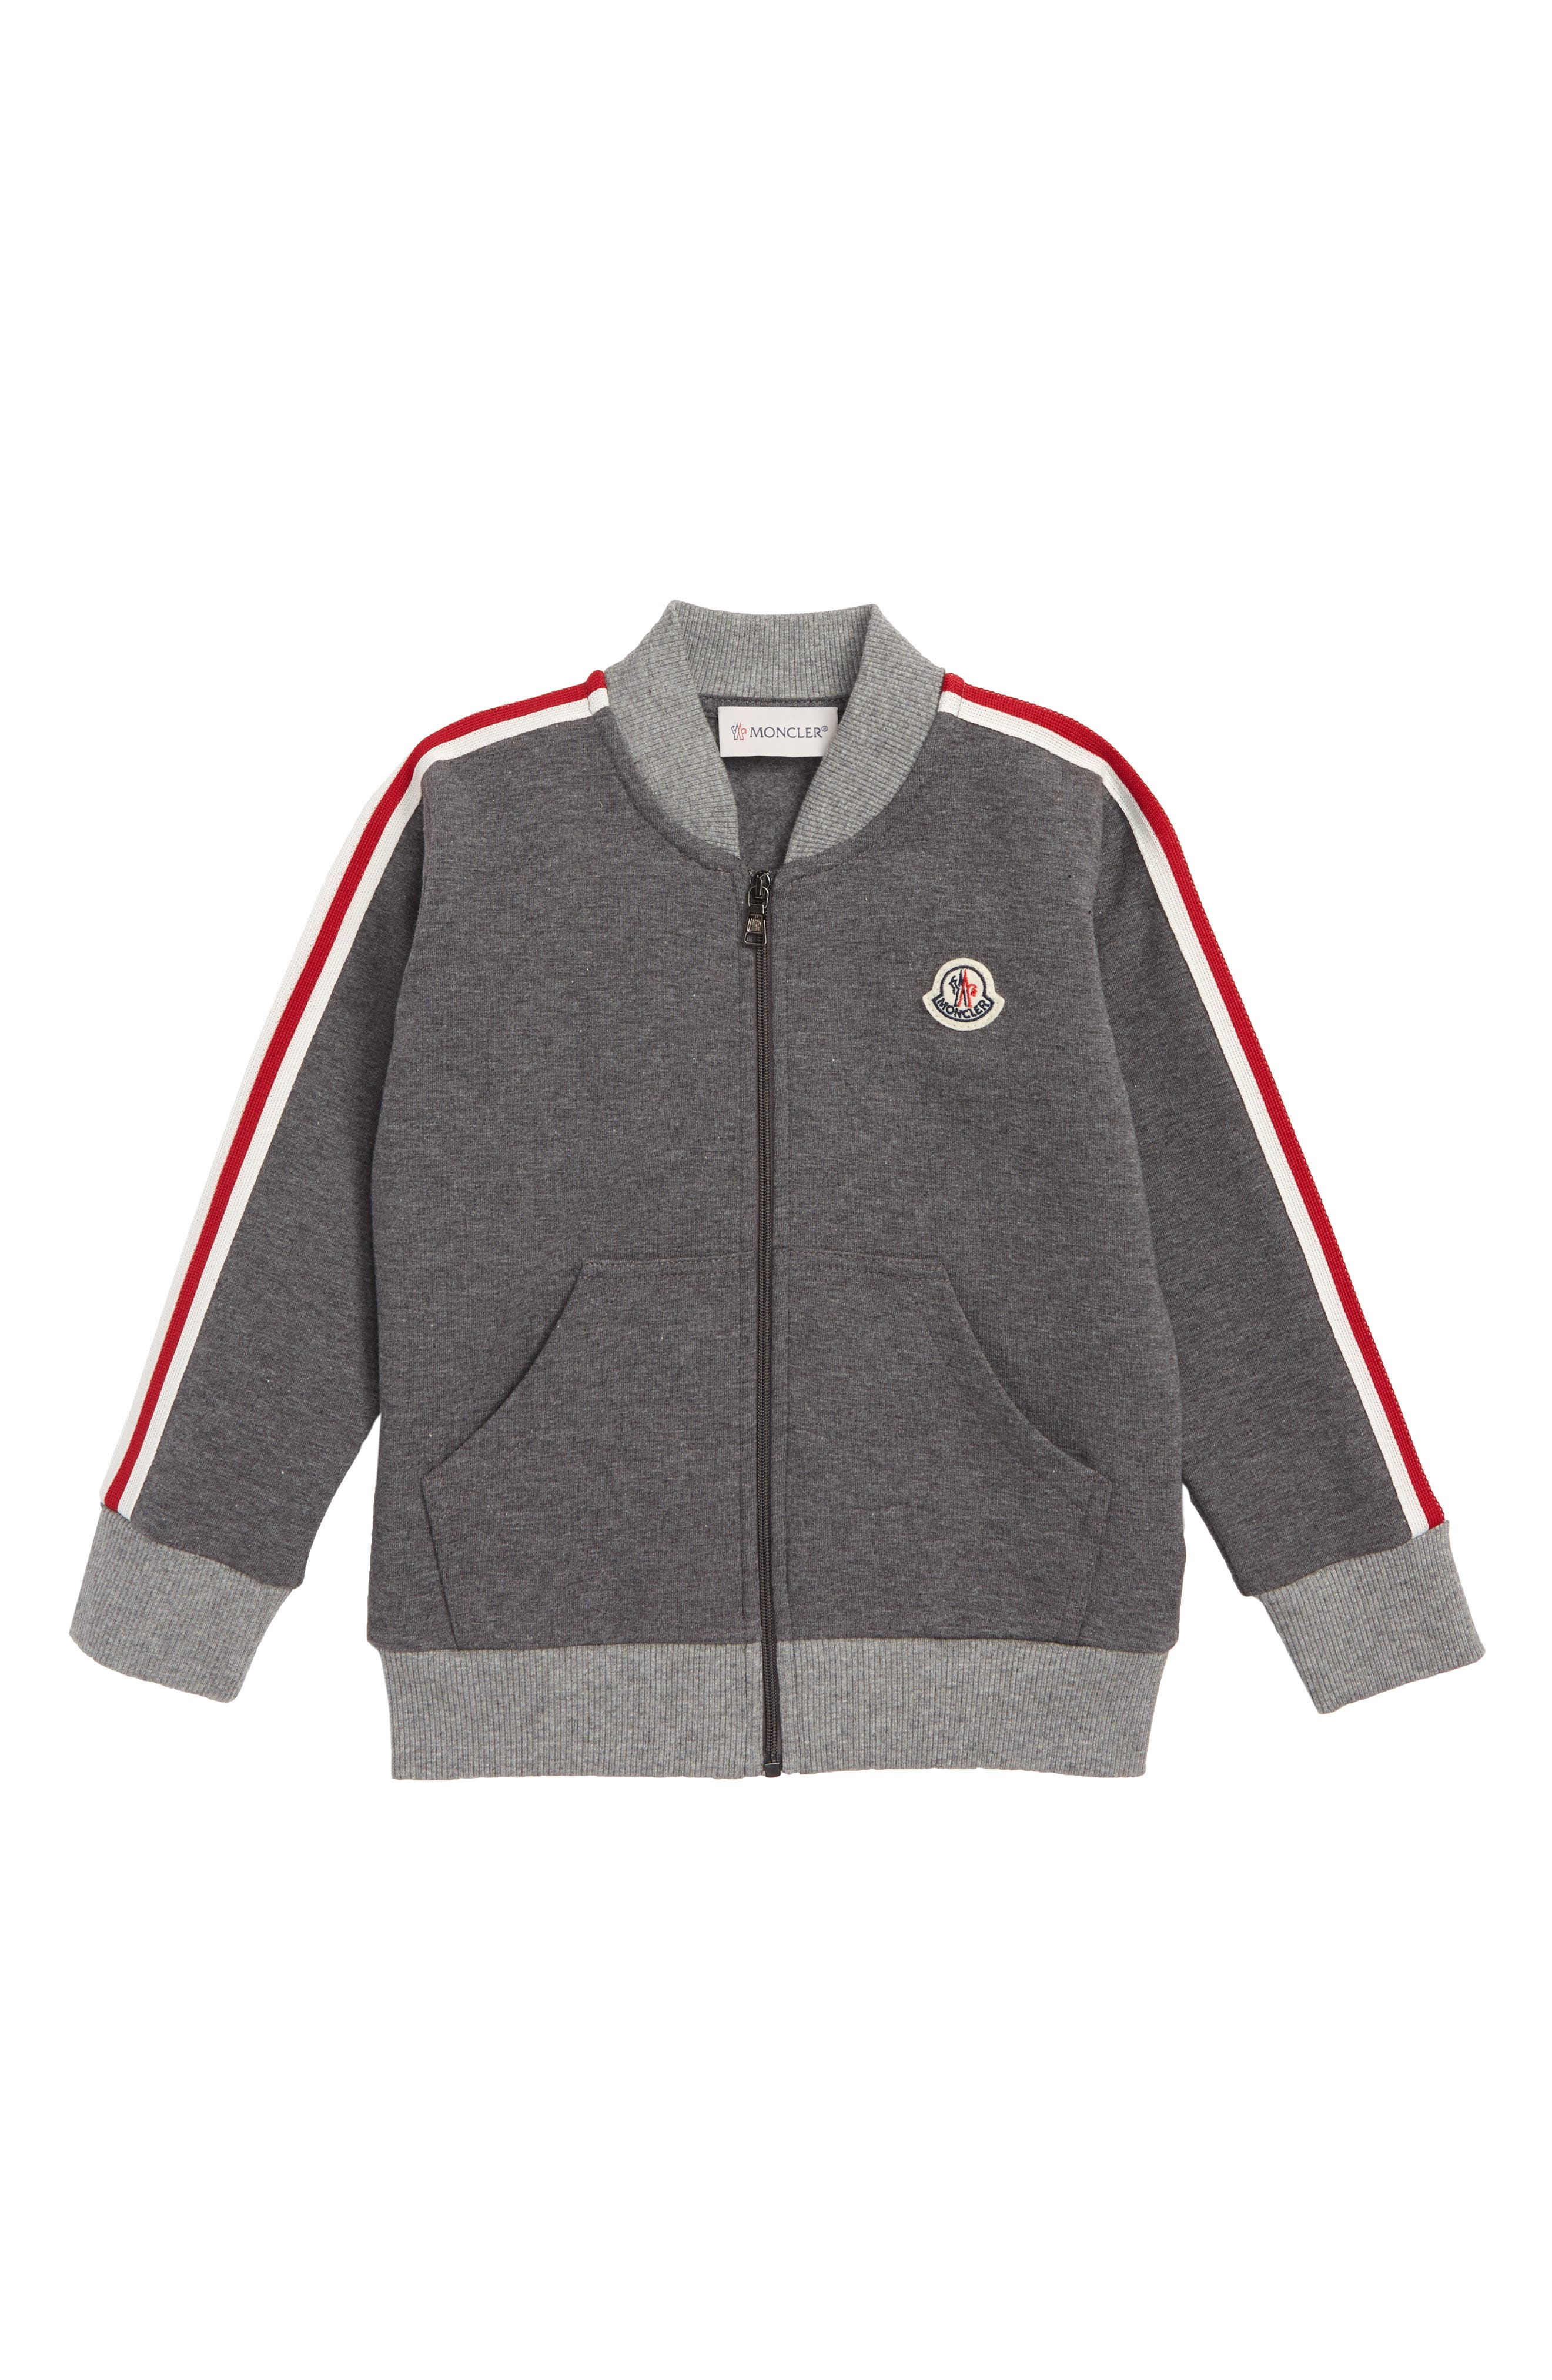 Maglia Zip Sweater,                             Main thumbnail 1, color,                             GREY